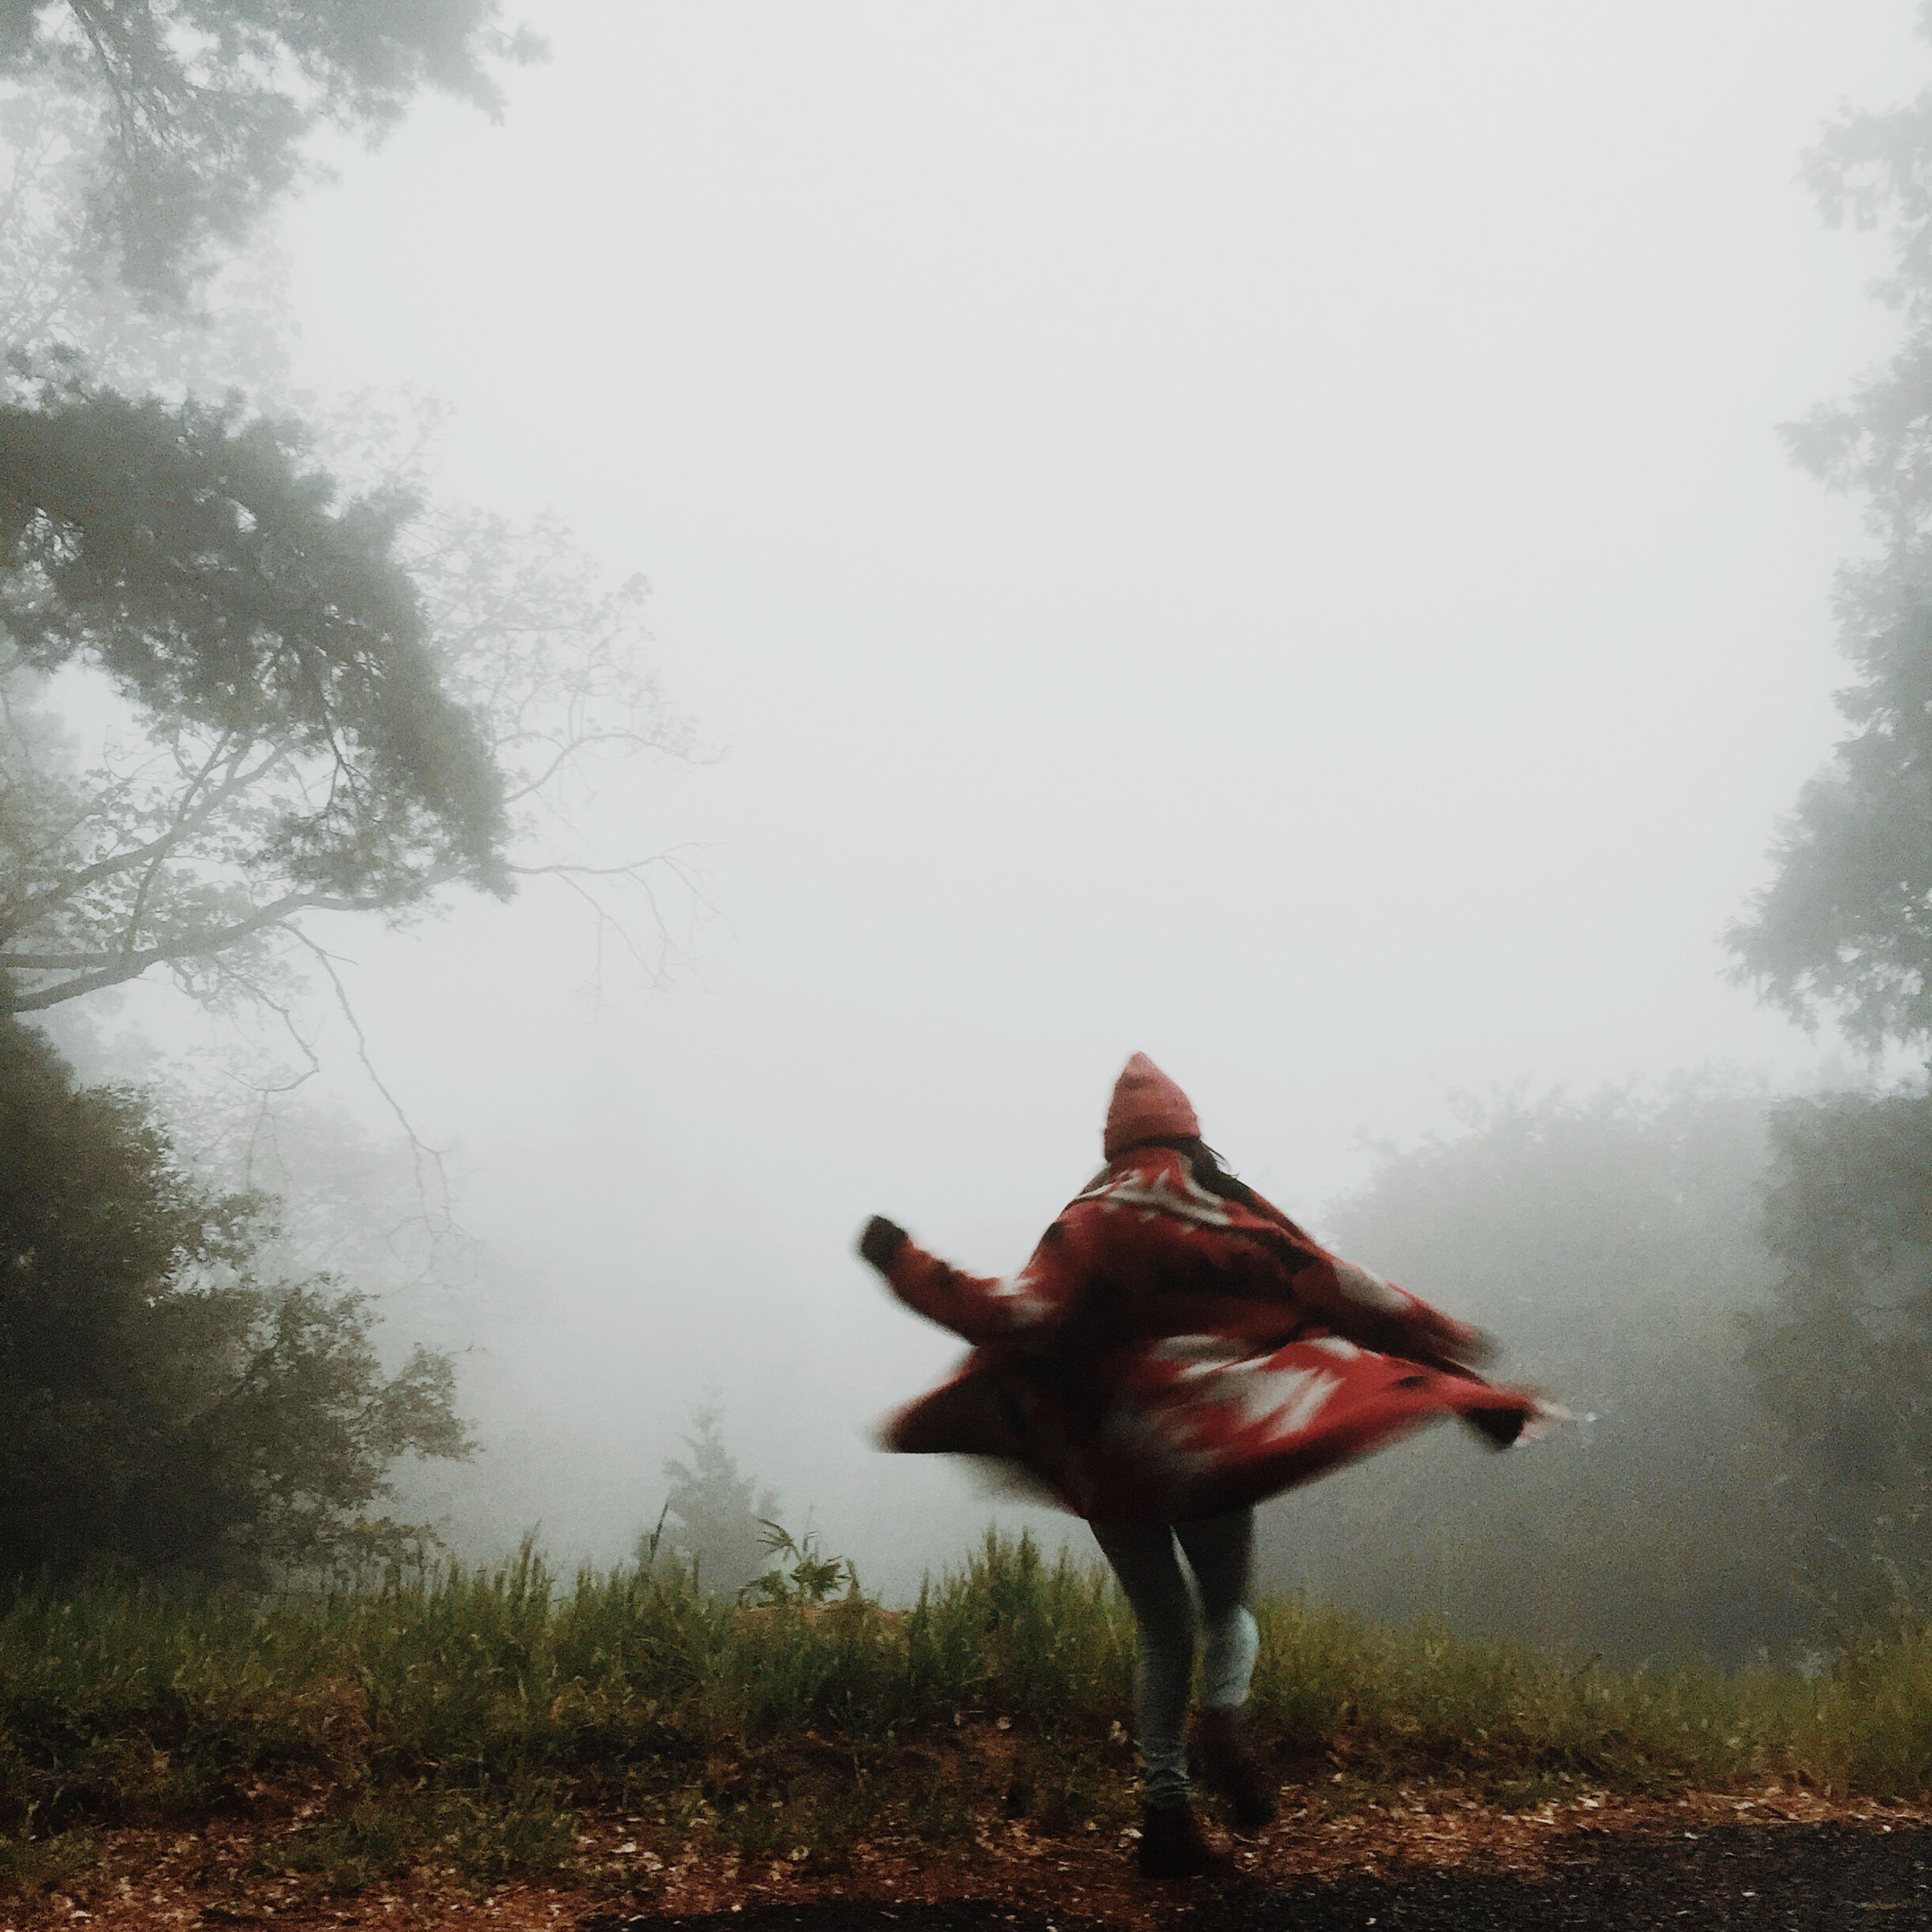 Motion in fog | Katch Silva